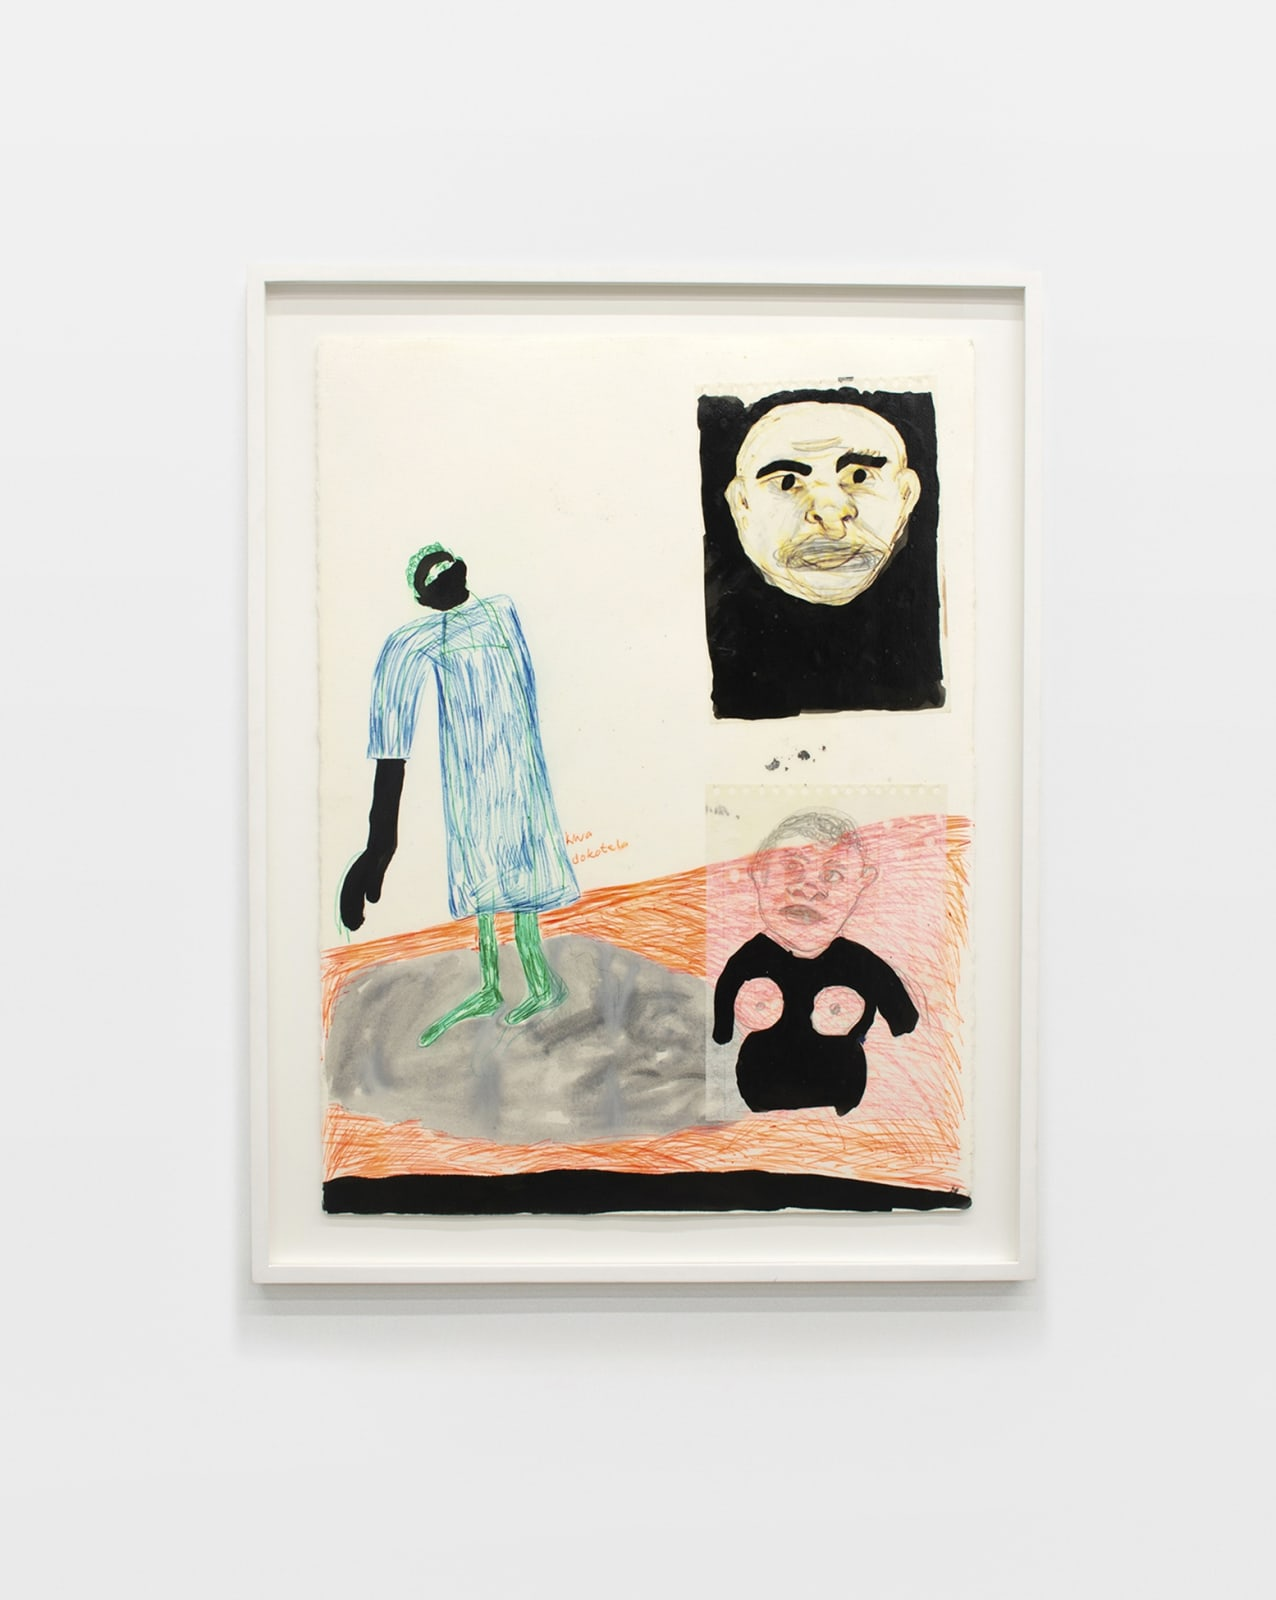 Moshekwa Langa Kwa-Dokotela, 2007 Mixed media on paper 30 3/10 x 22 4/10 in (77 x 57 cm)